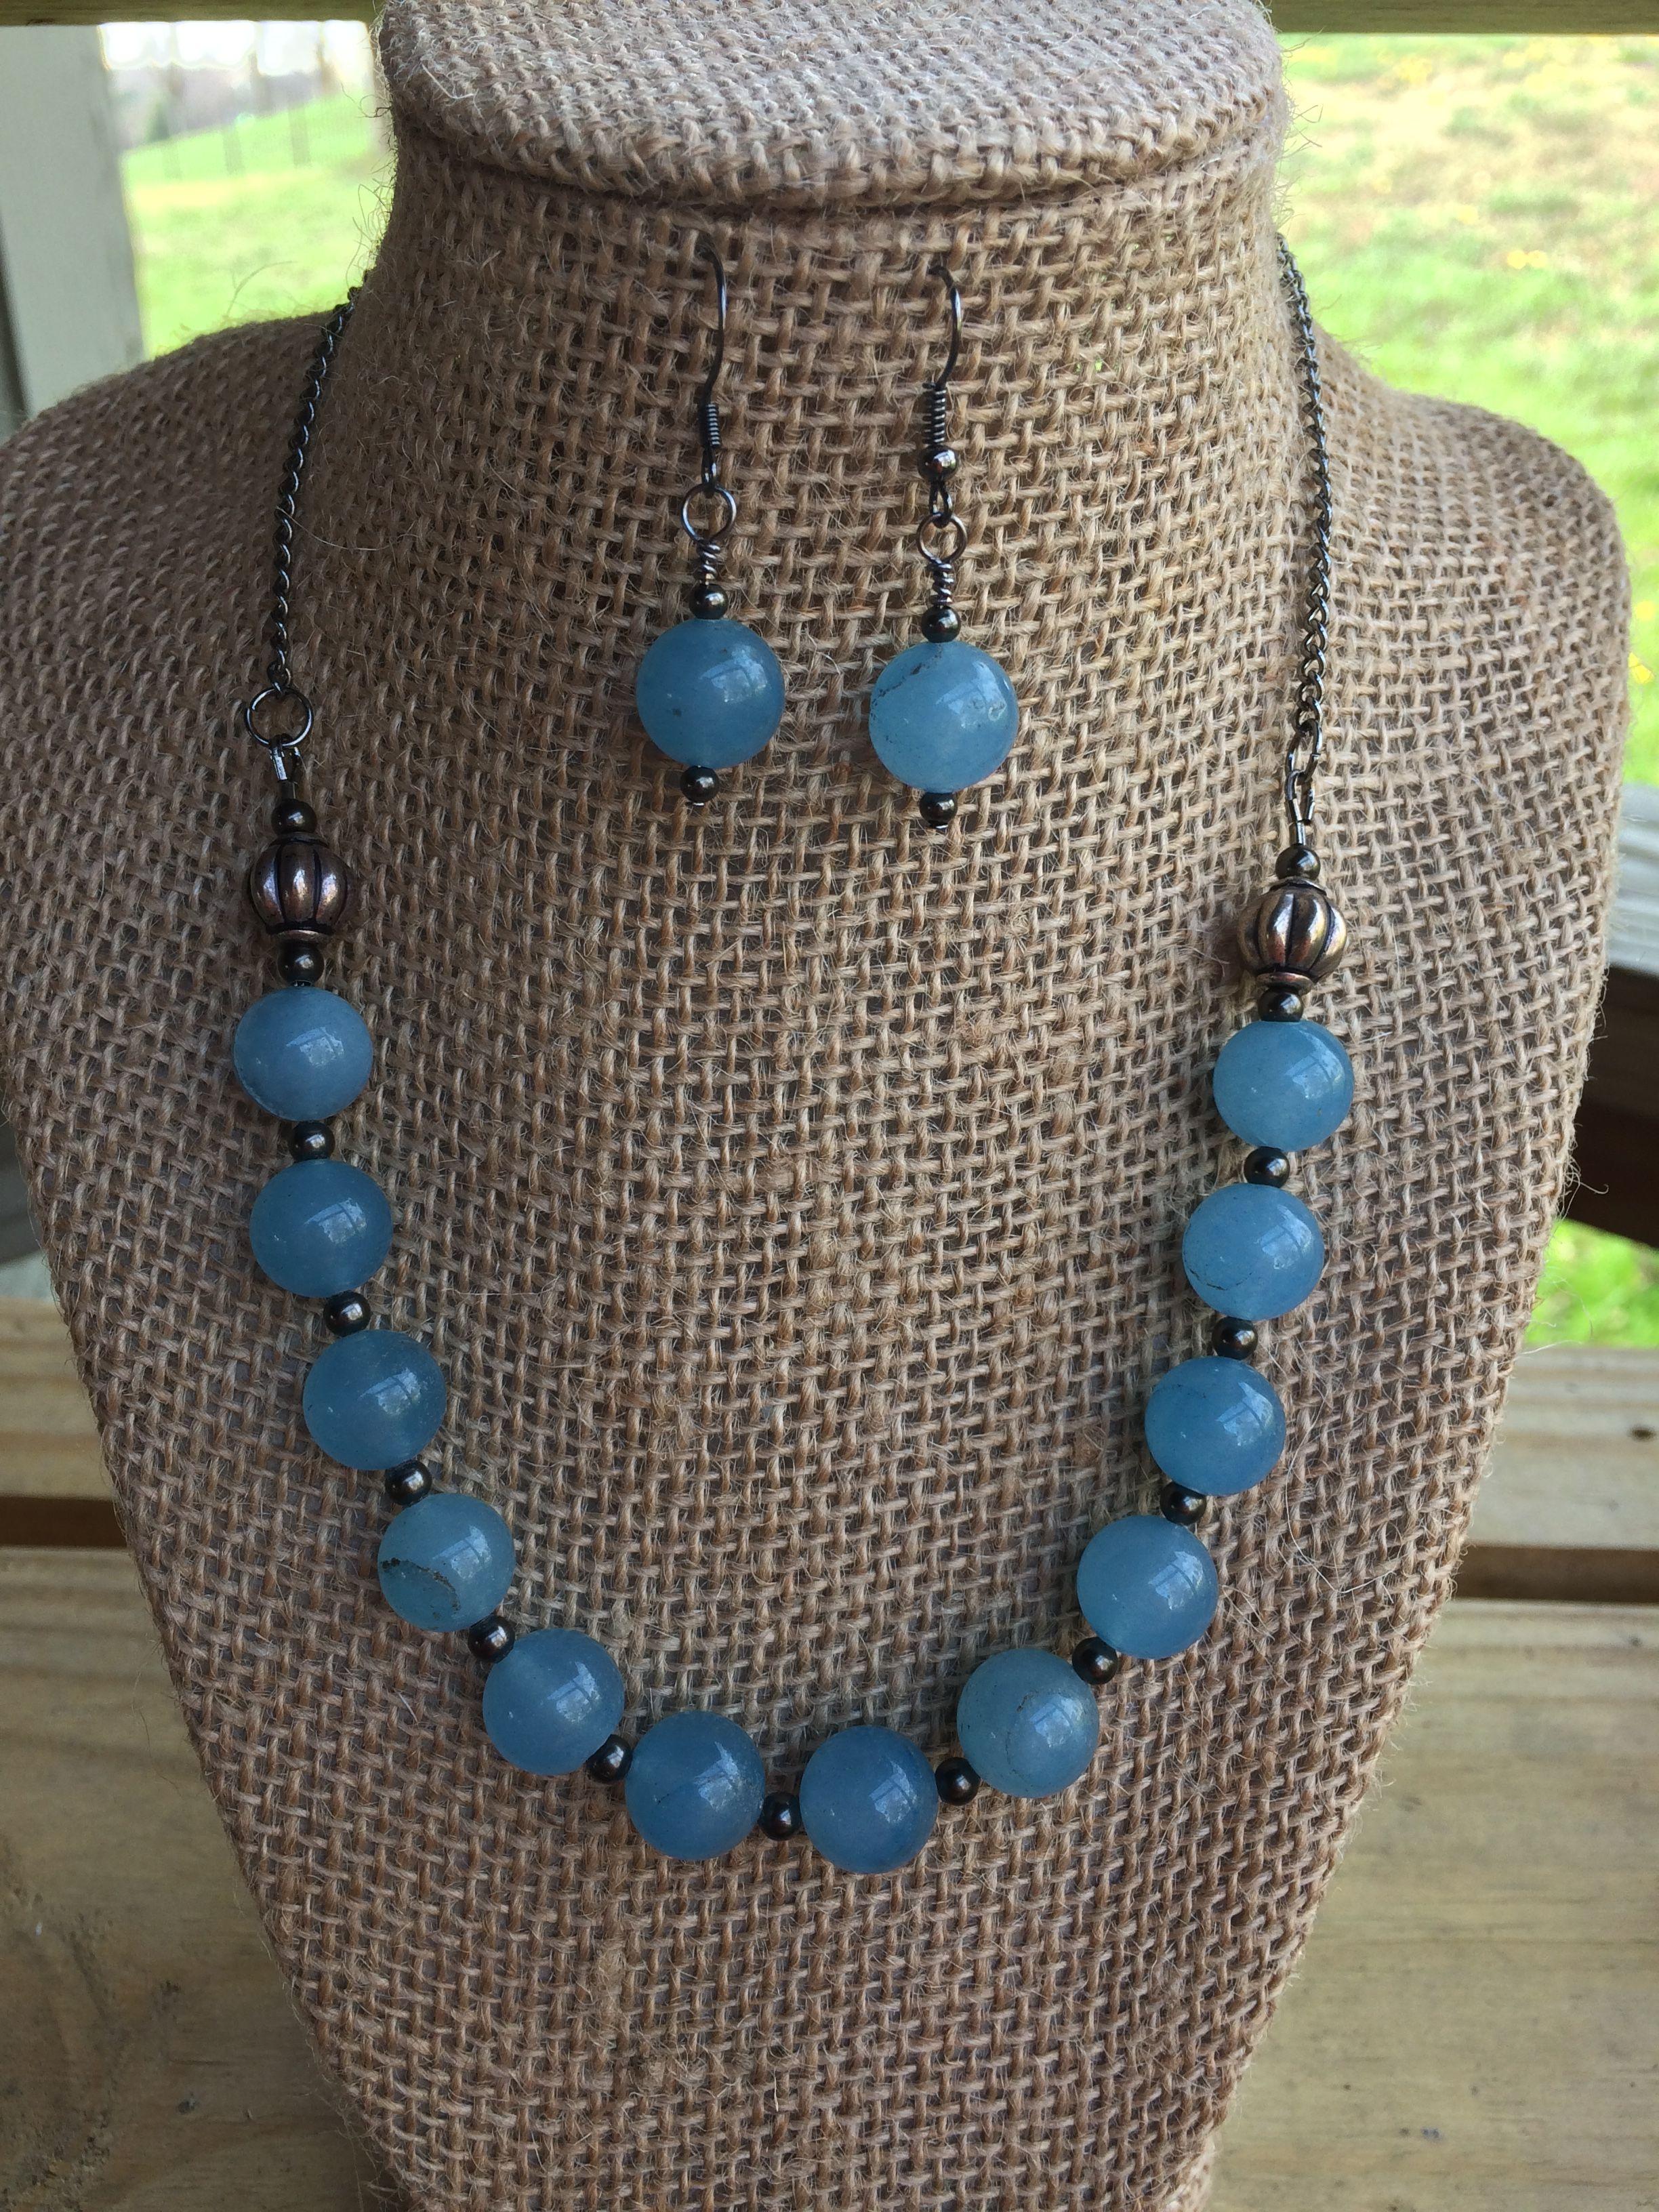 Tariza's light blue necklace.